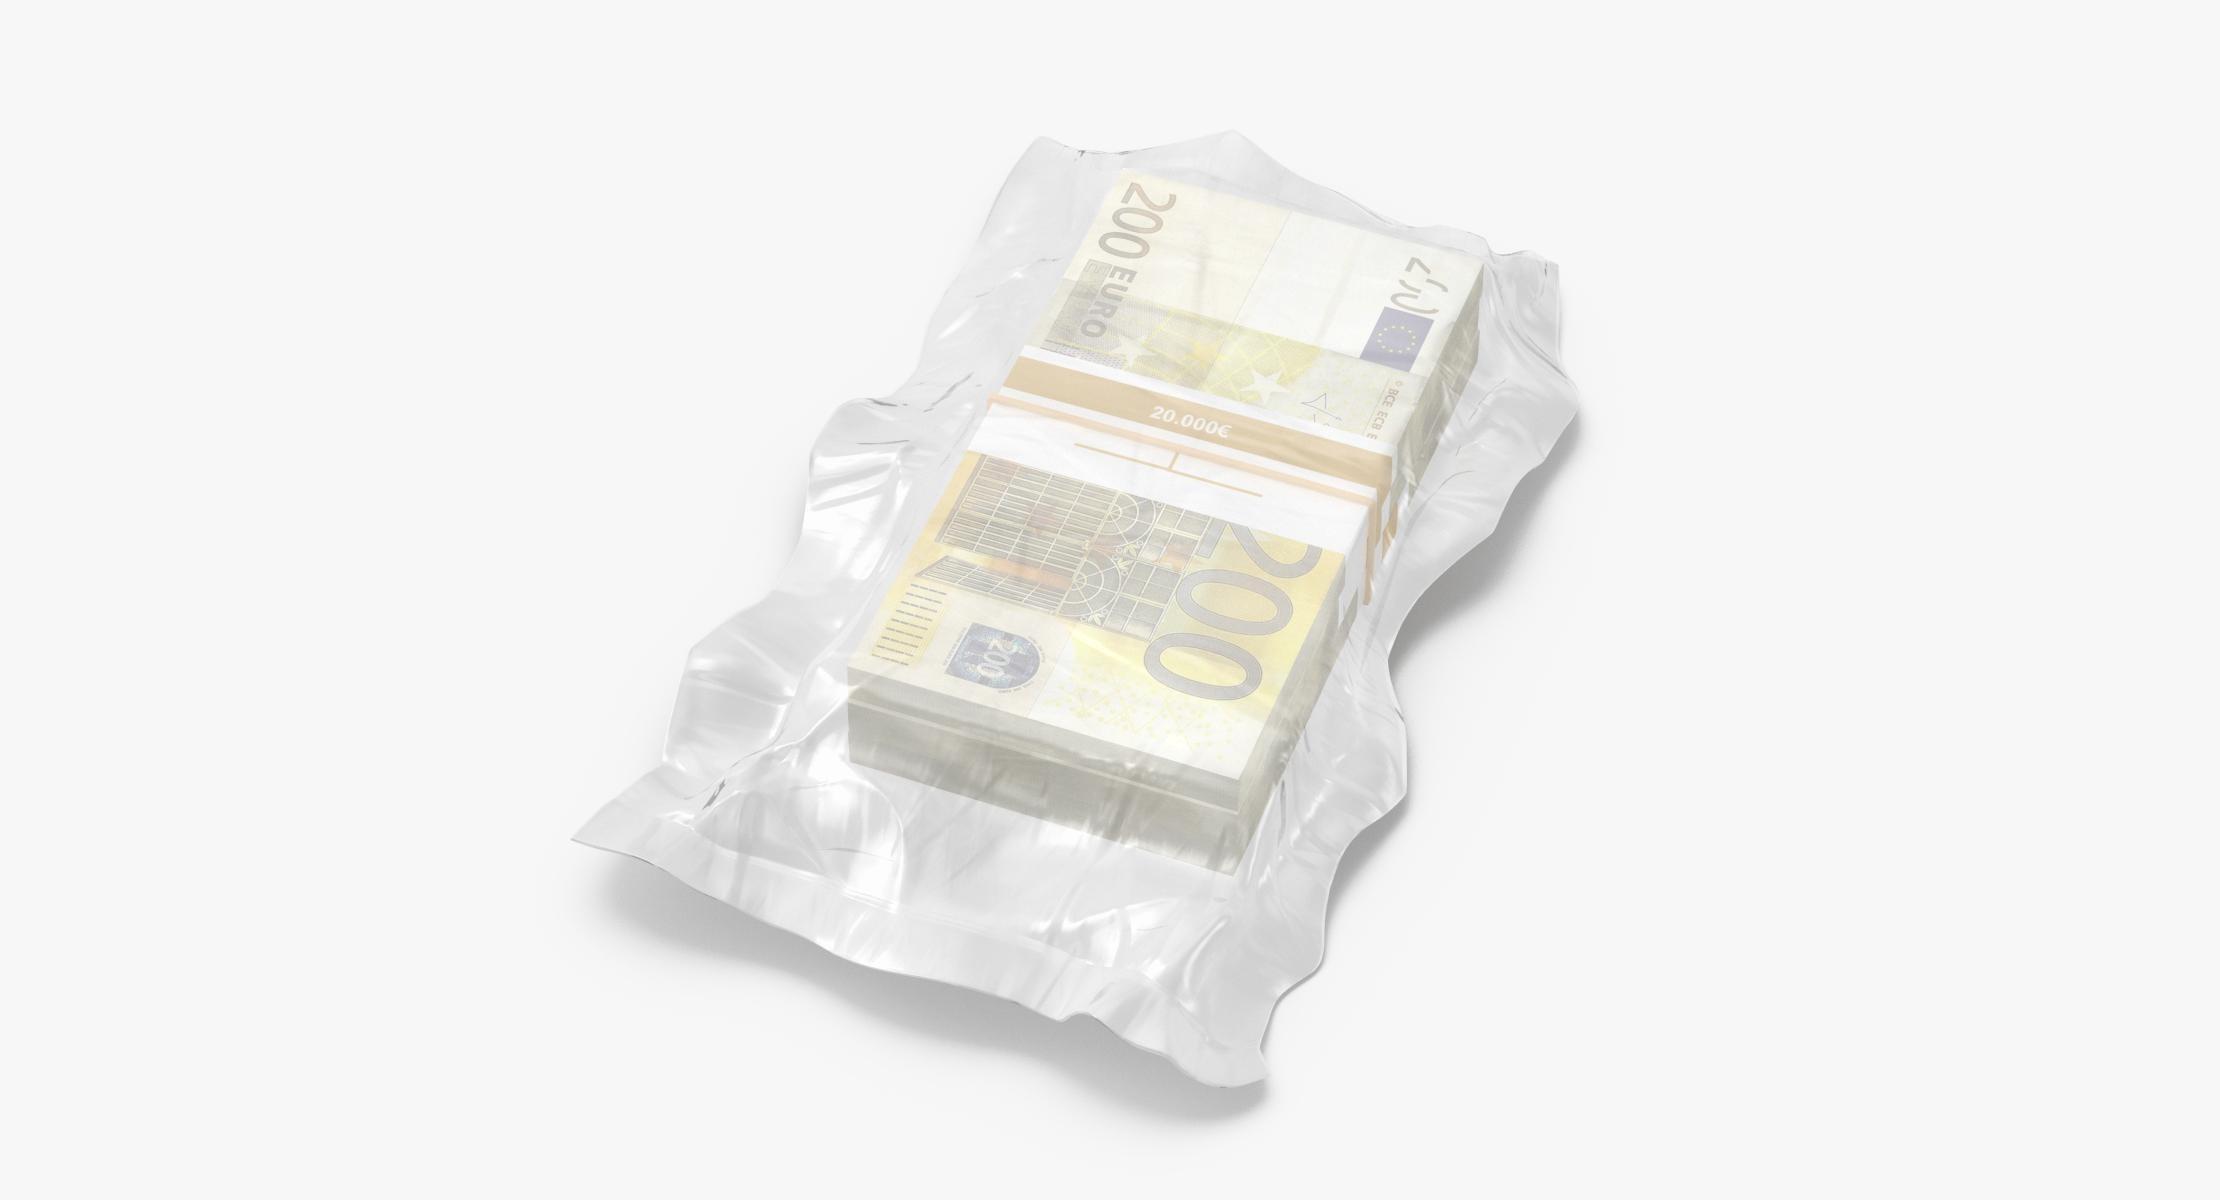 Wrapped Bills of Money - 200 Euro Stacks 01 - reel 1